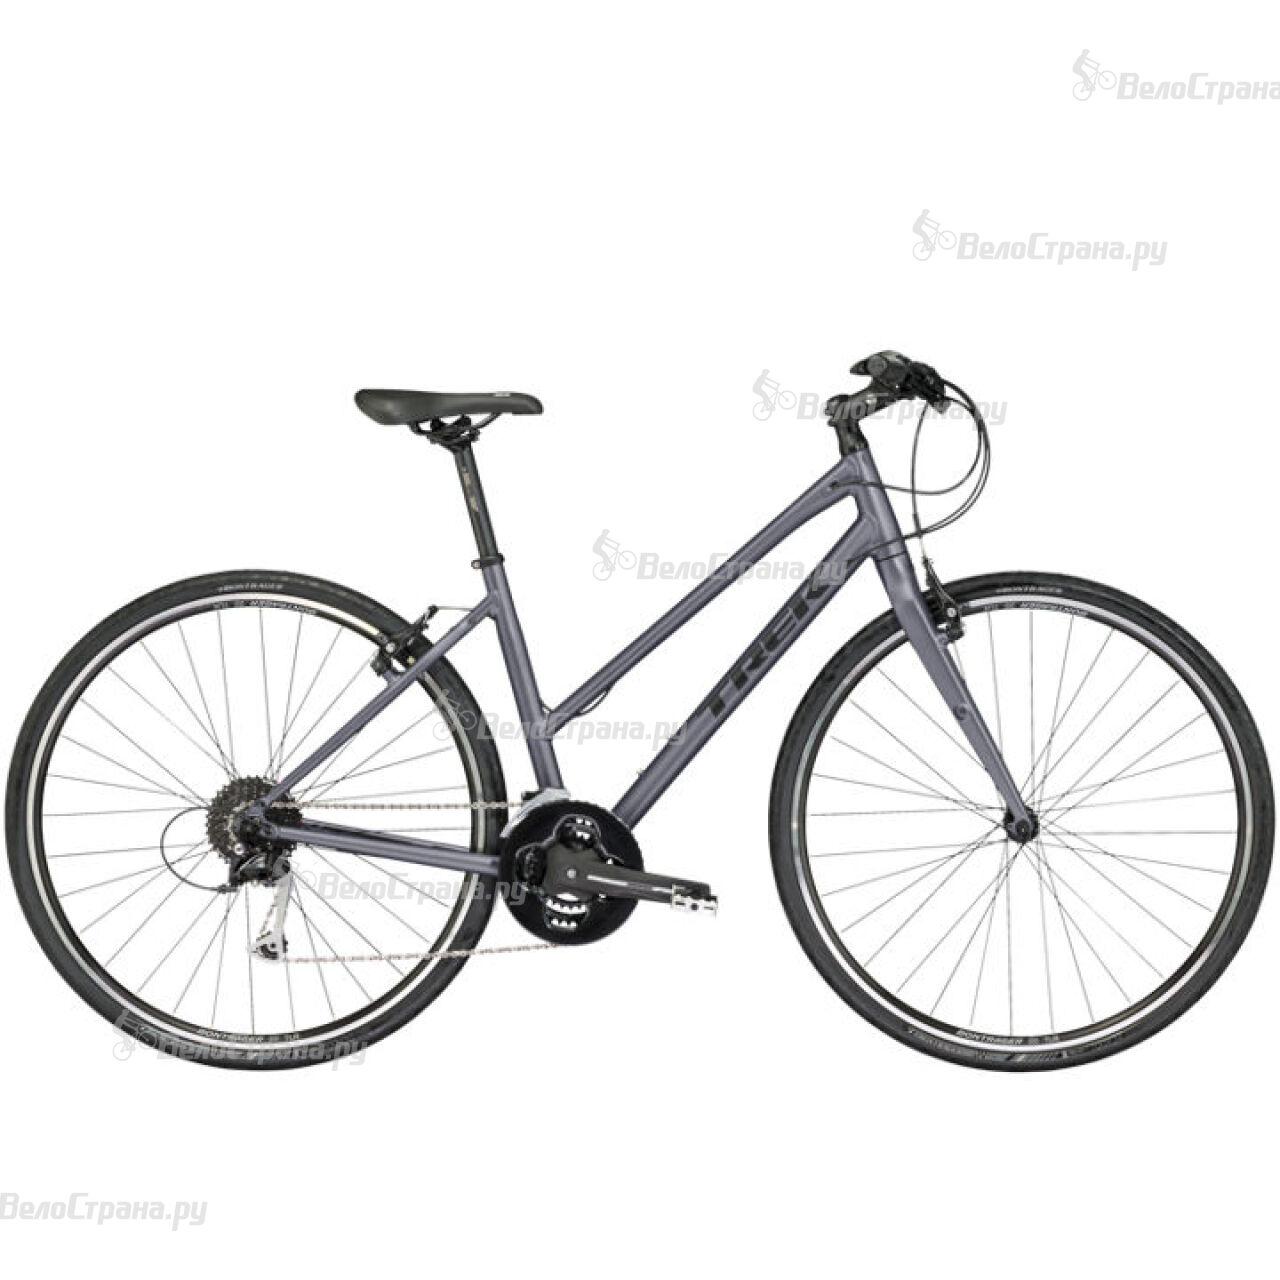 Велосипед Trek FX 3 WSD (2017) велосипед trek madone 3 1 wsd 2013